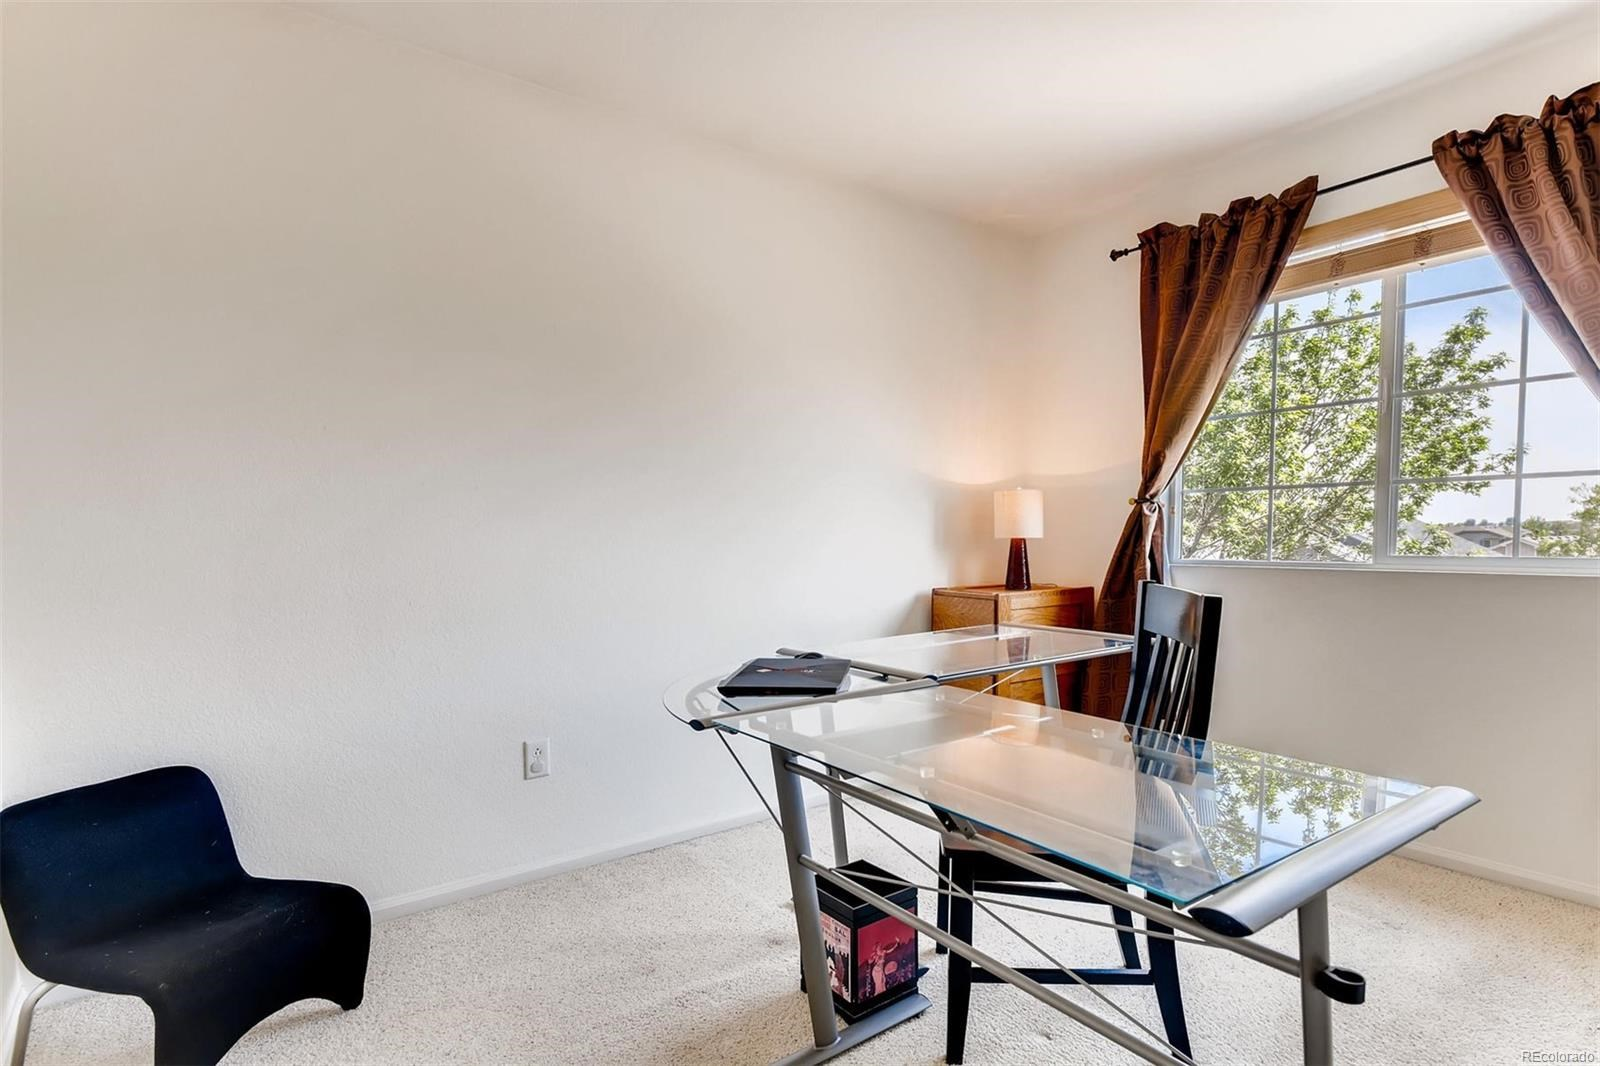 MLS# 2464710 - 1 - 5895  E 129th Place, Thornton, CO 80602